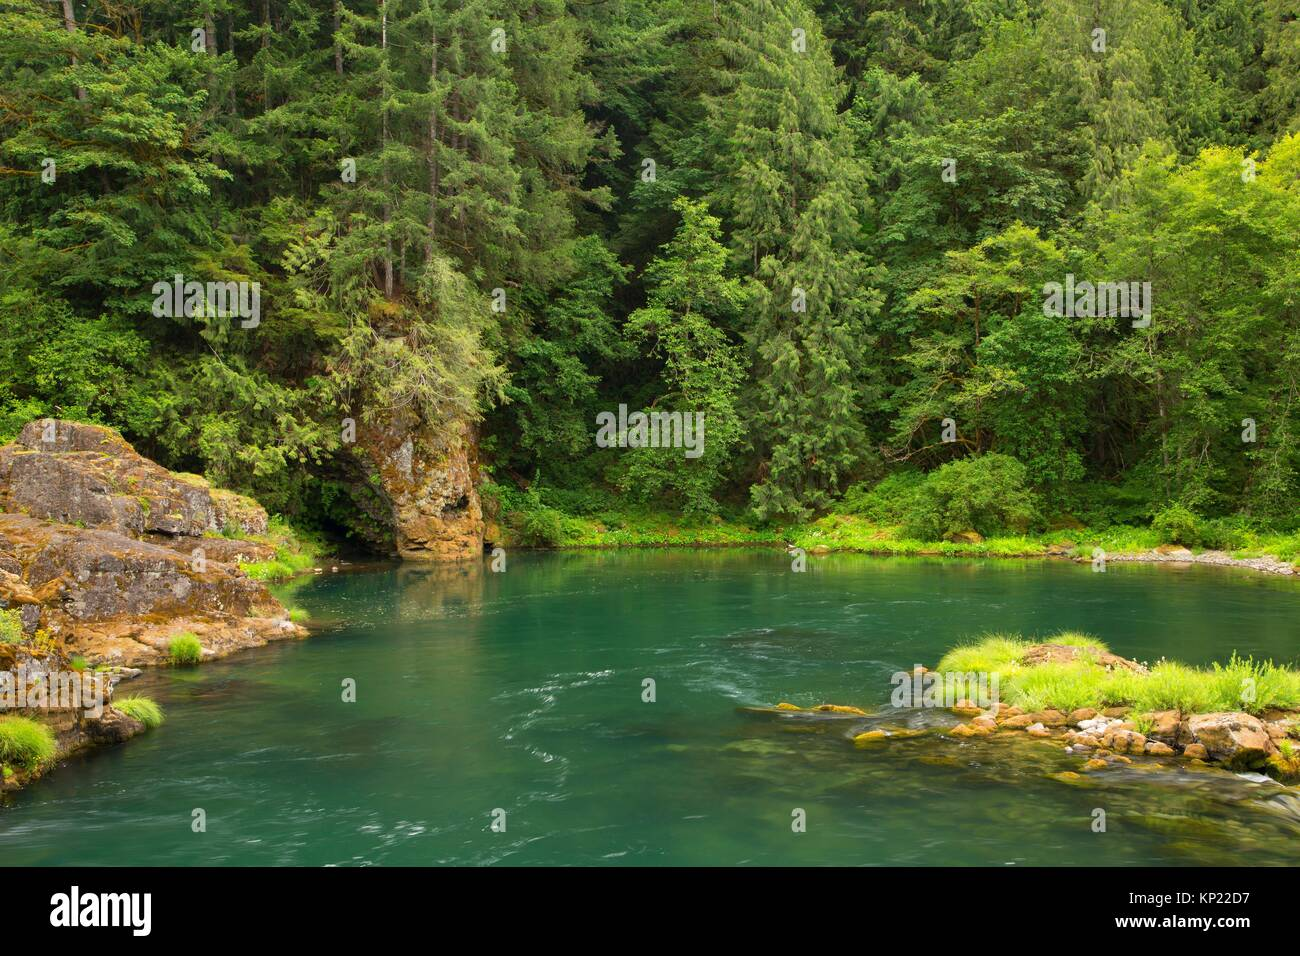 North Santiam River, Niagara County Park, Marion County, Oregon. - Stock Image